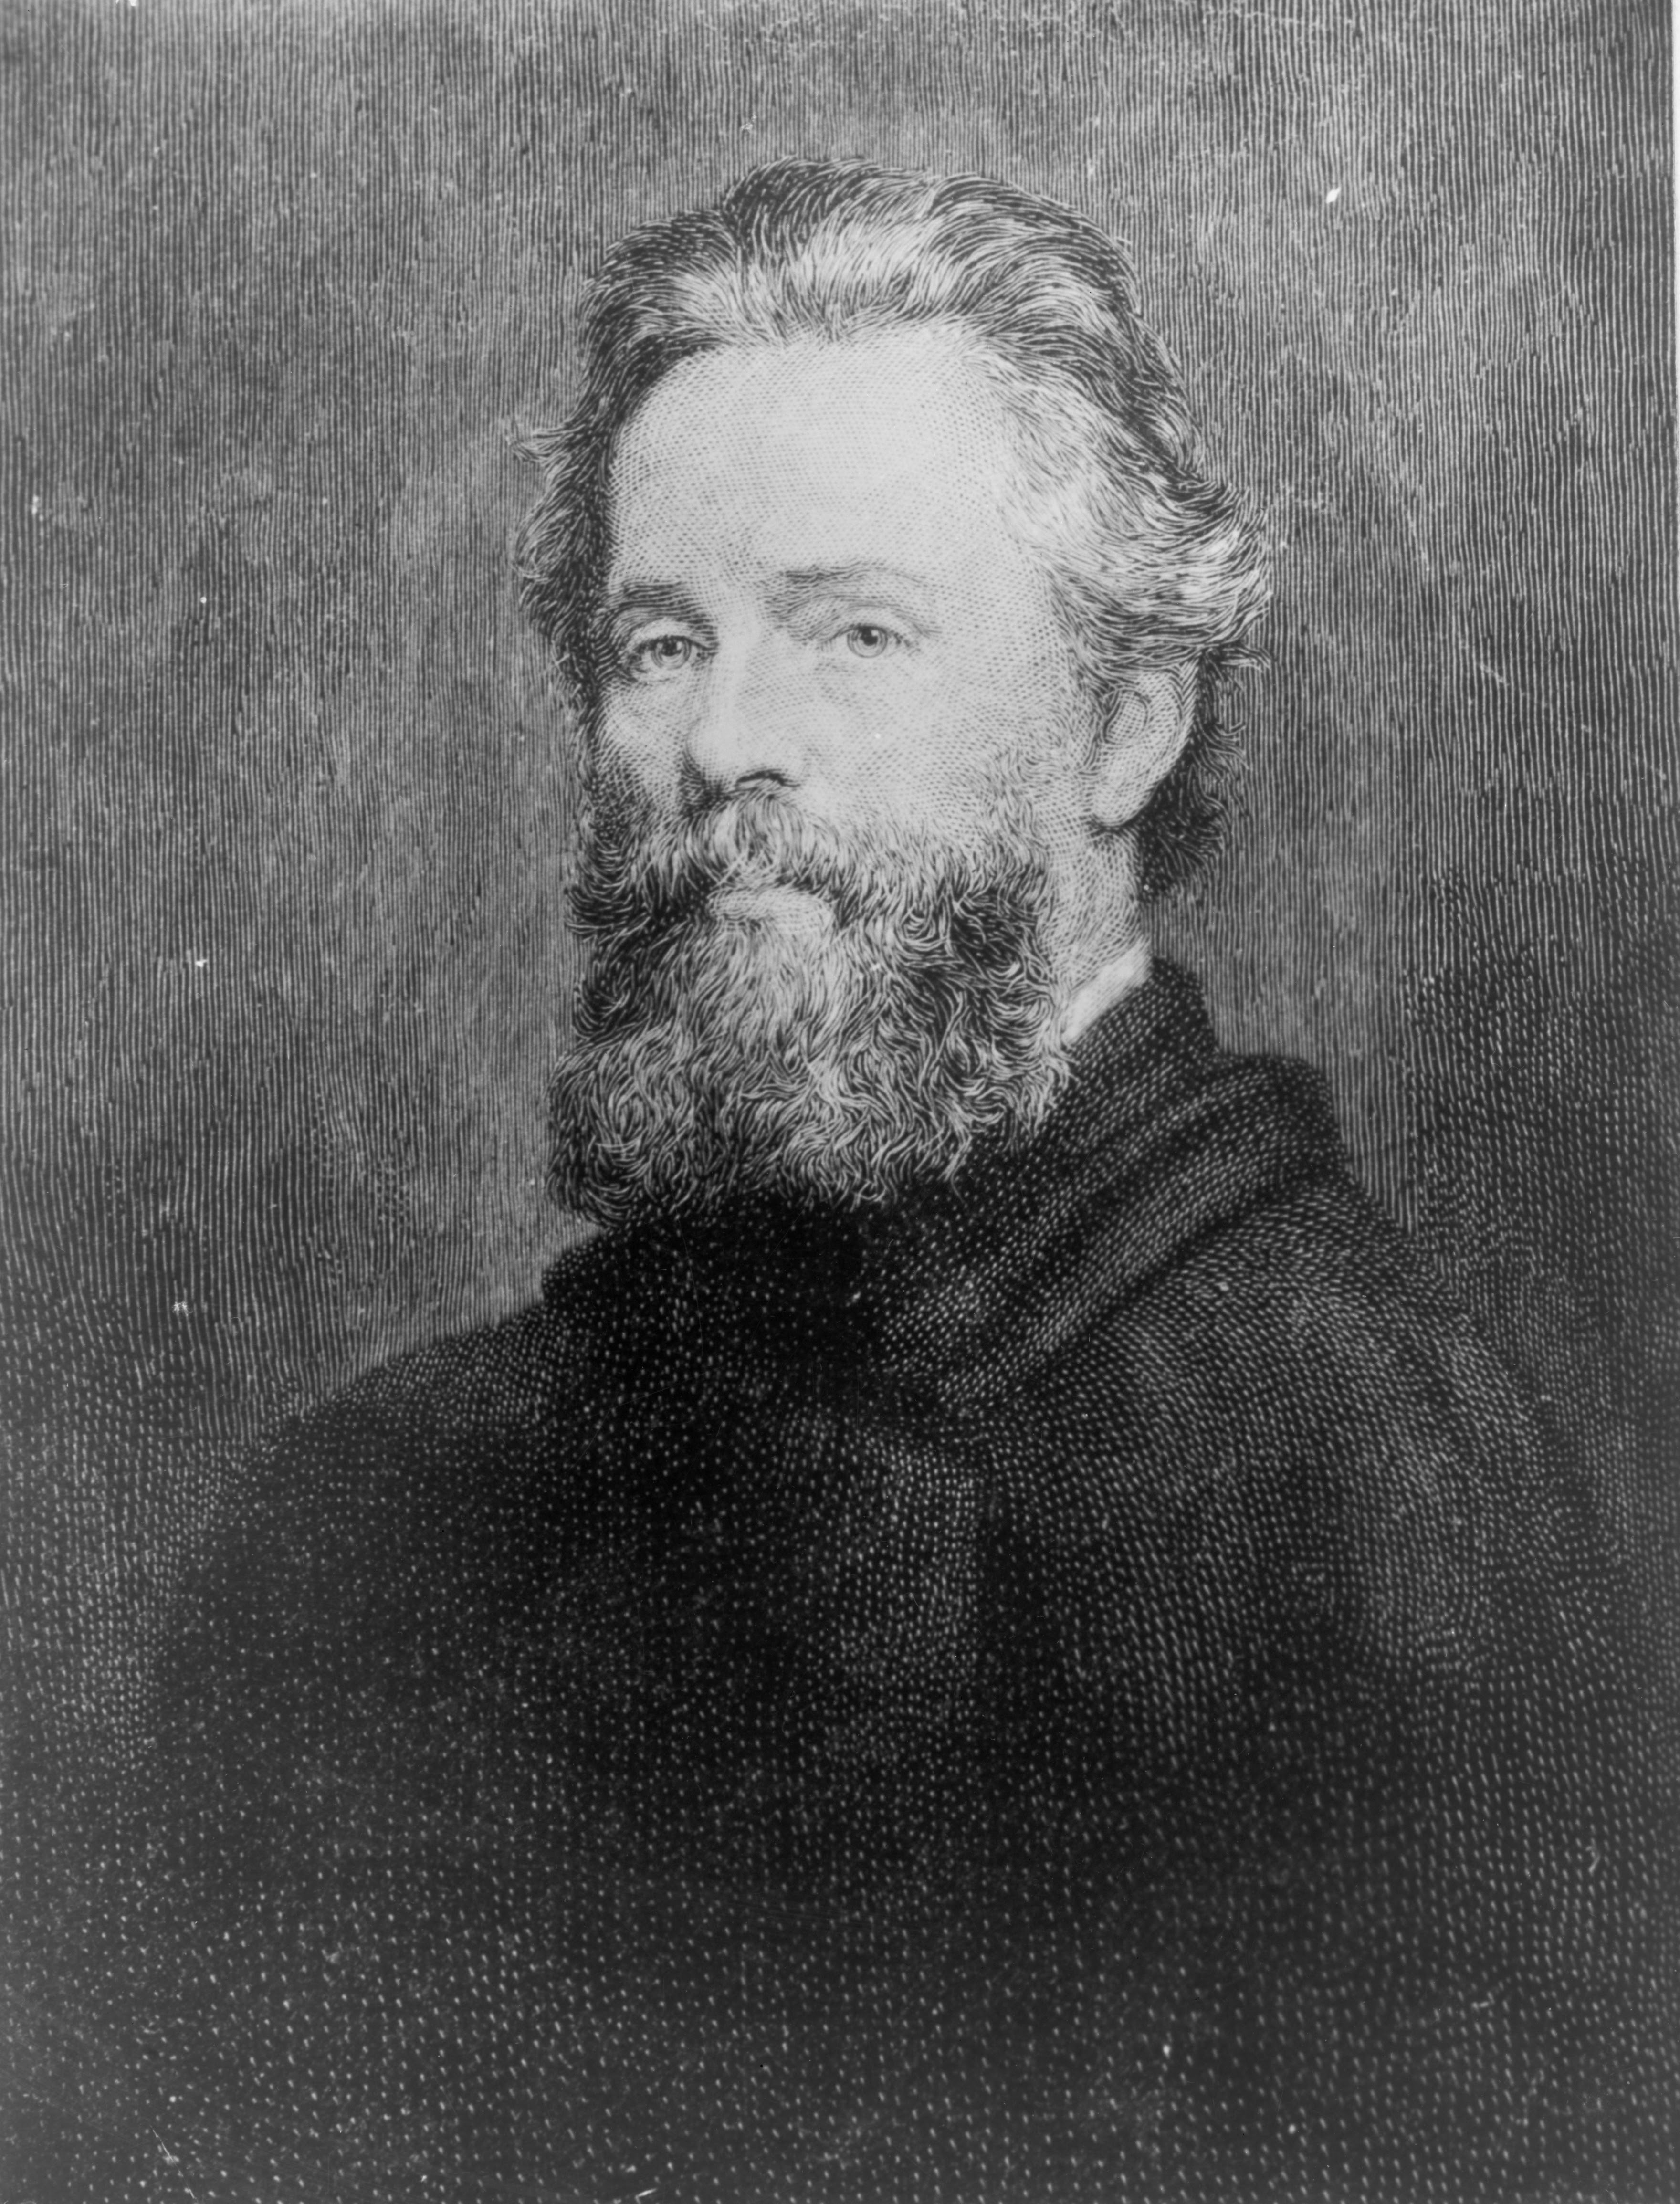 http://upload.wikimedia.org/wikipedia/commons/f/f1/Herman_Melville.jpg